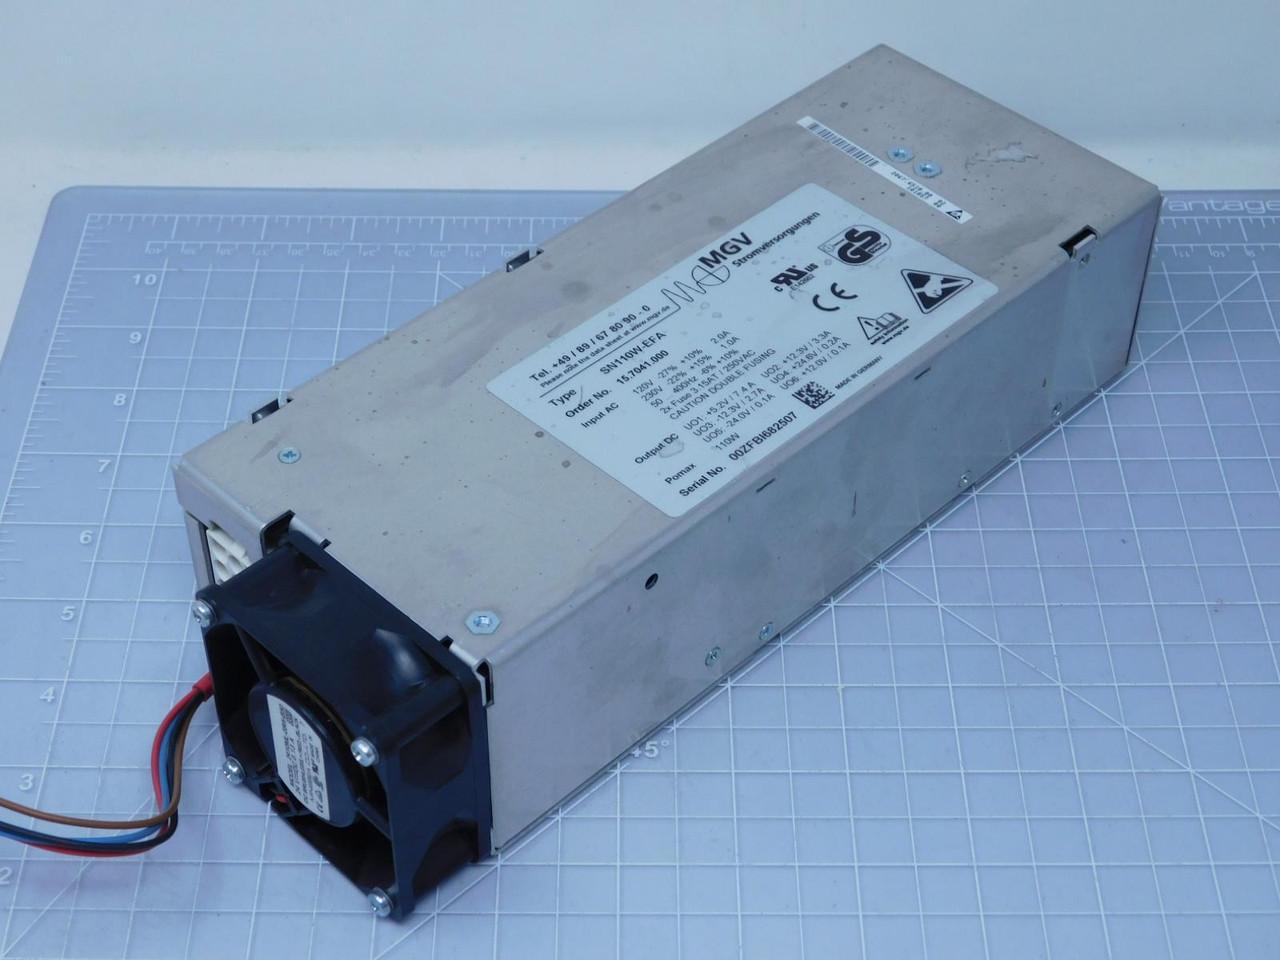 NEW ORIGINAL TT105N16LOF POWER MODULE SUPPLIED BY FFIISS